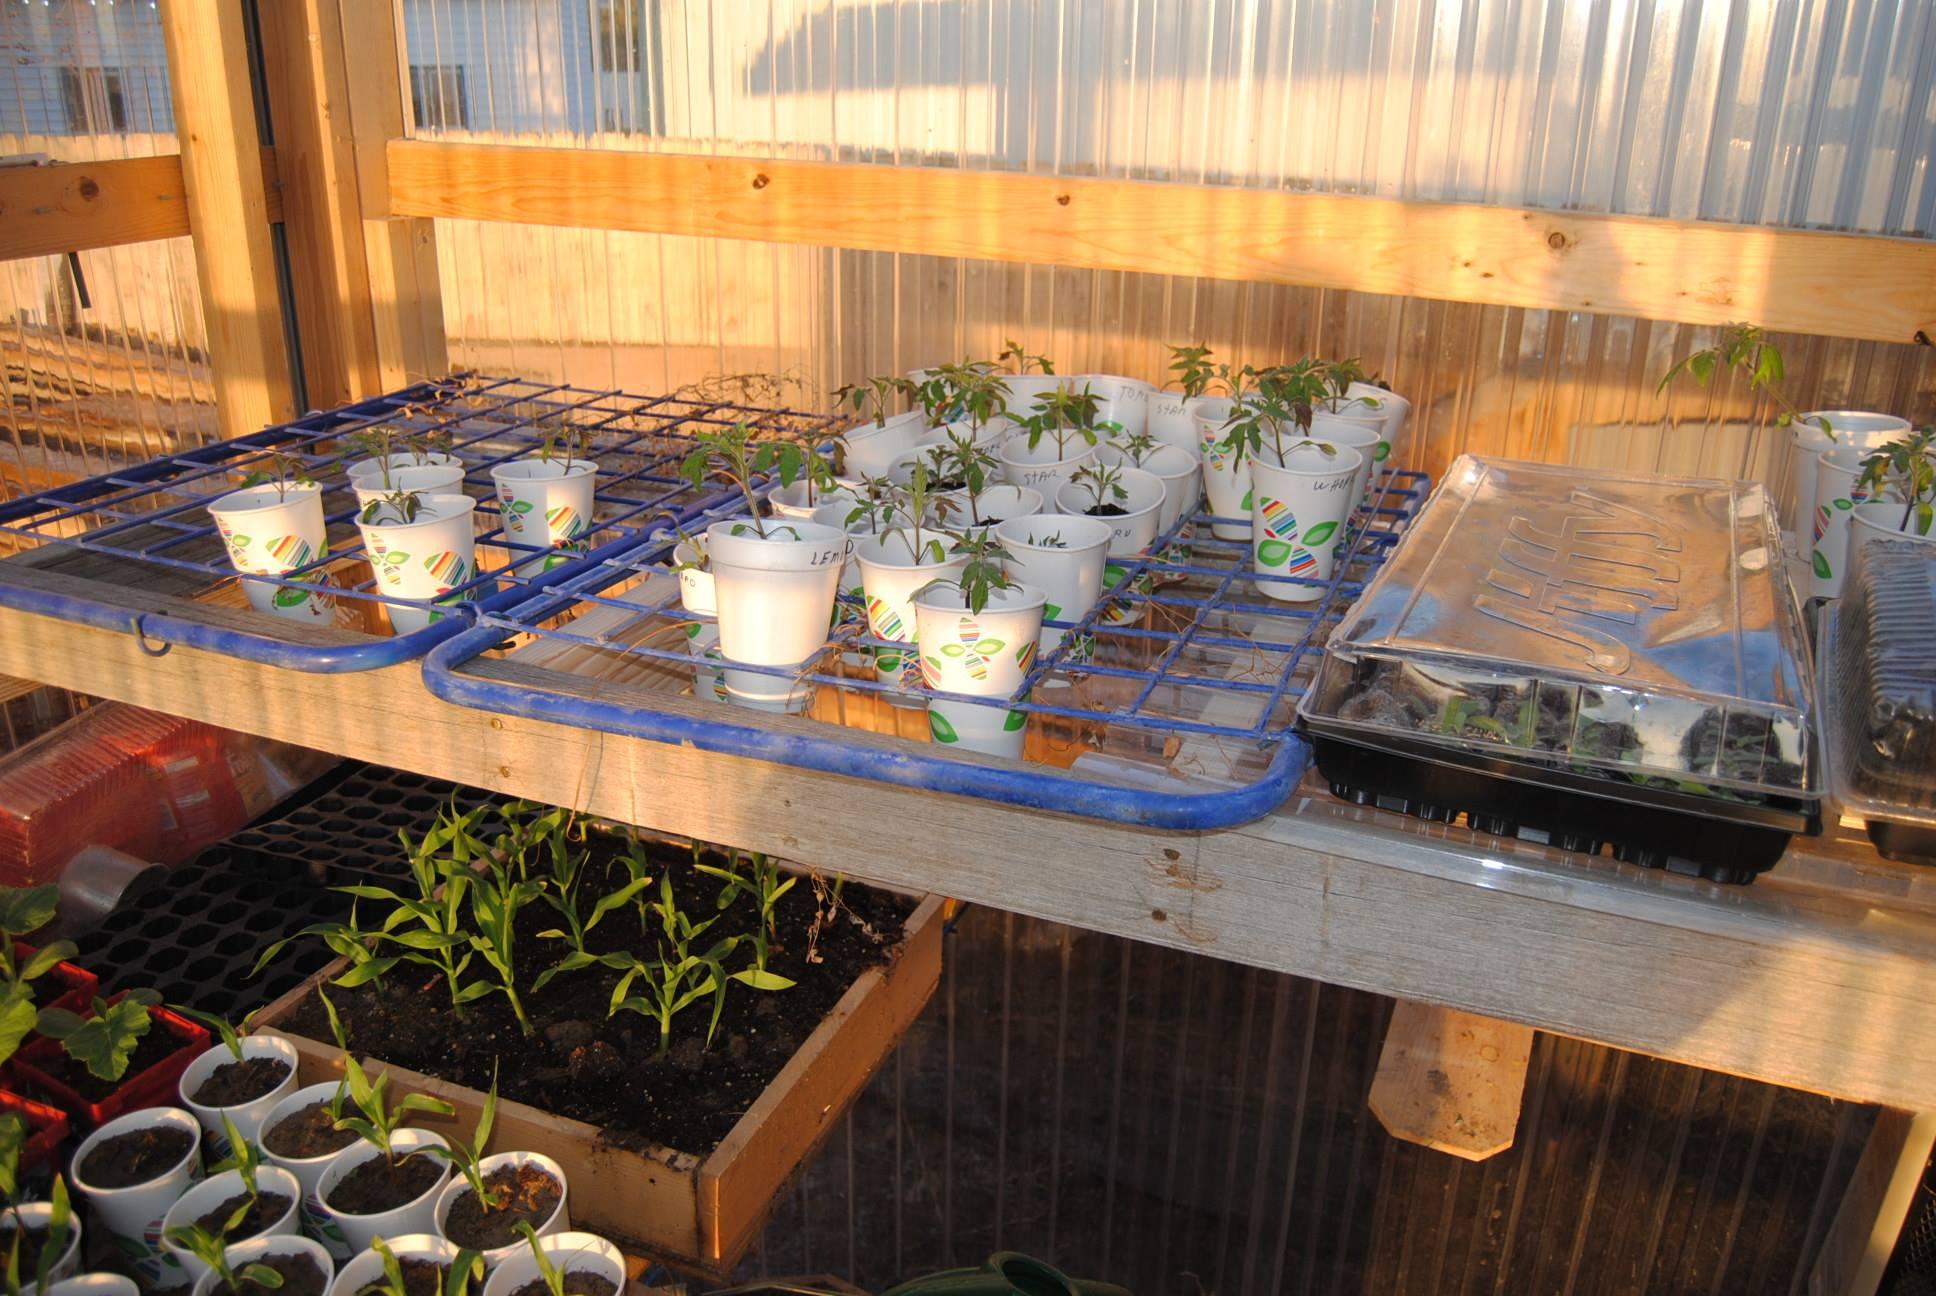 greenhouse green plants gardening